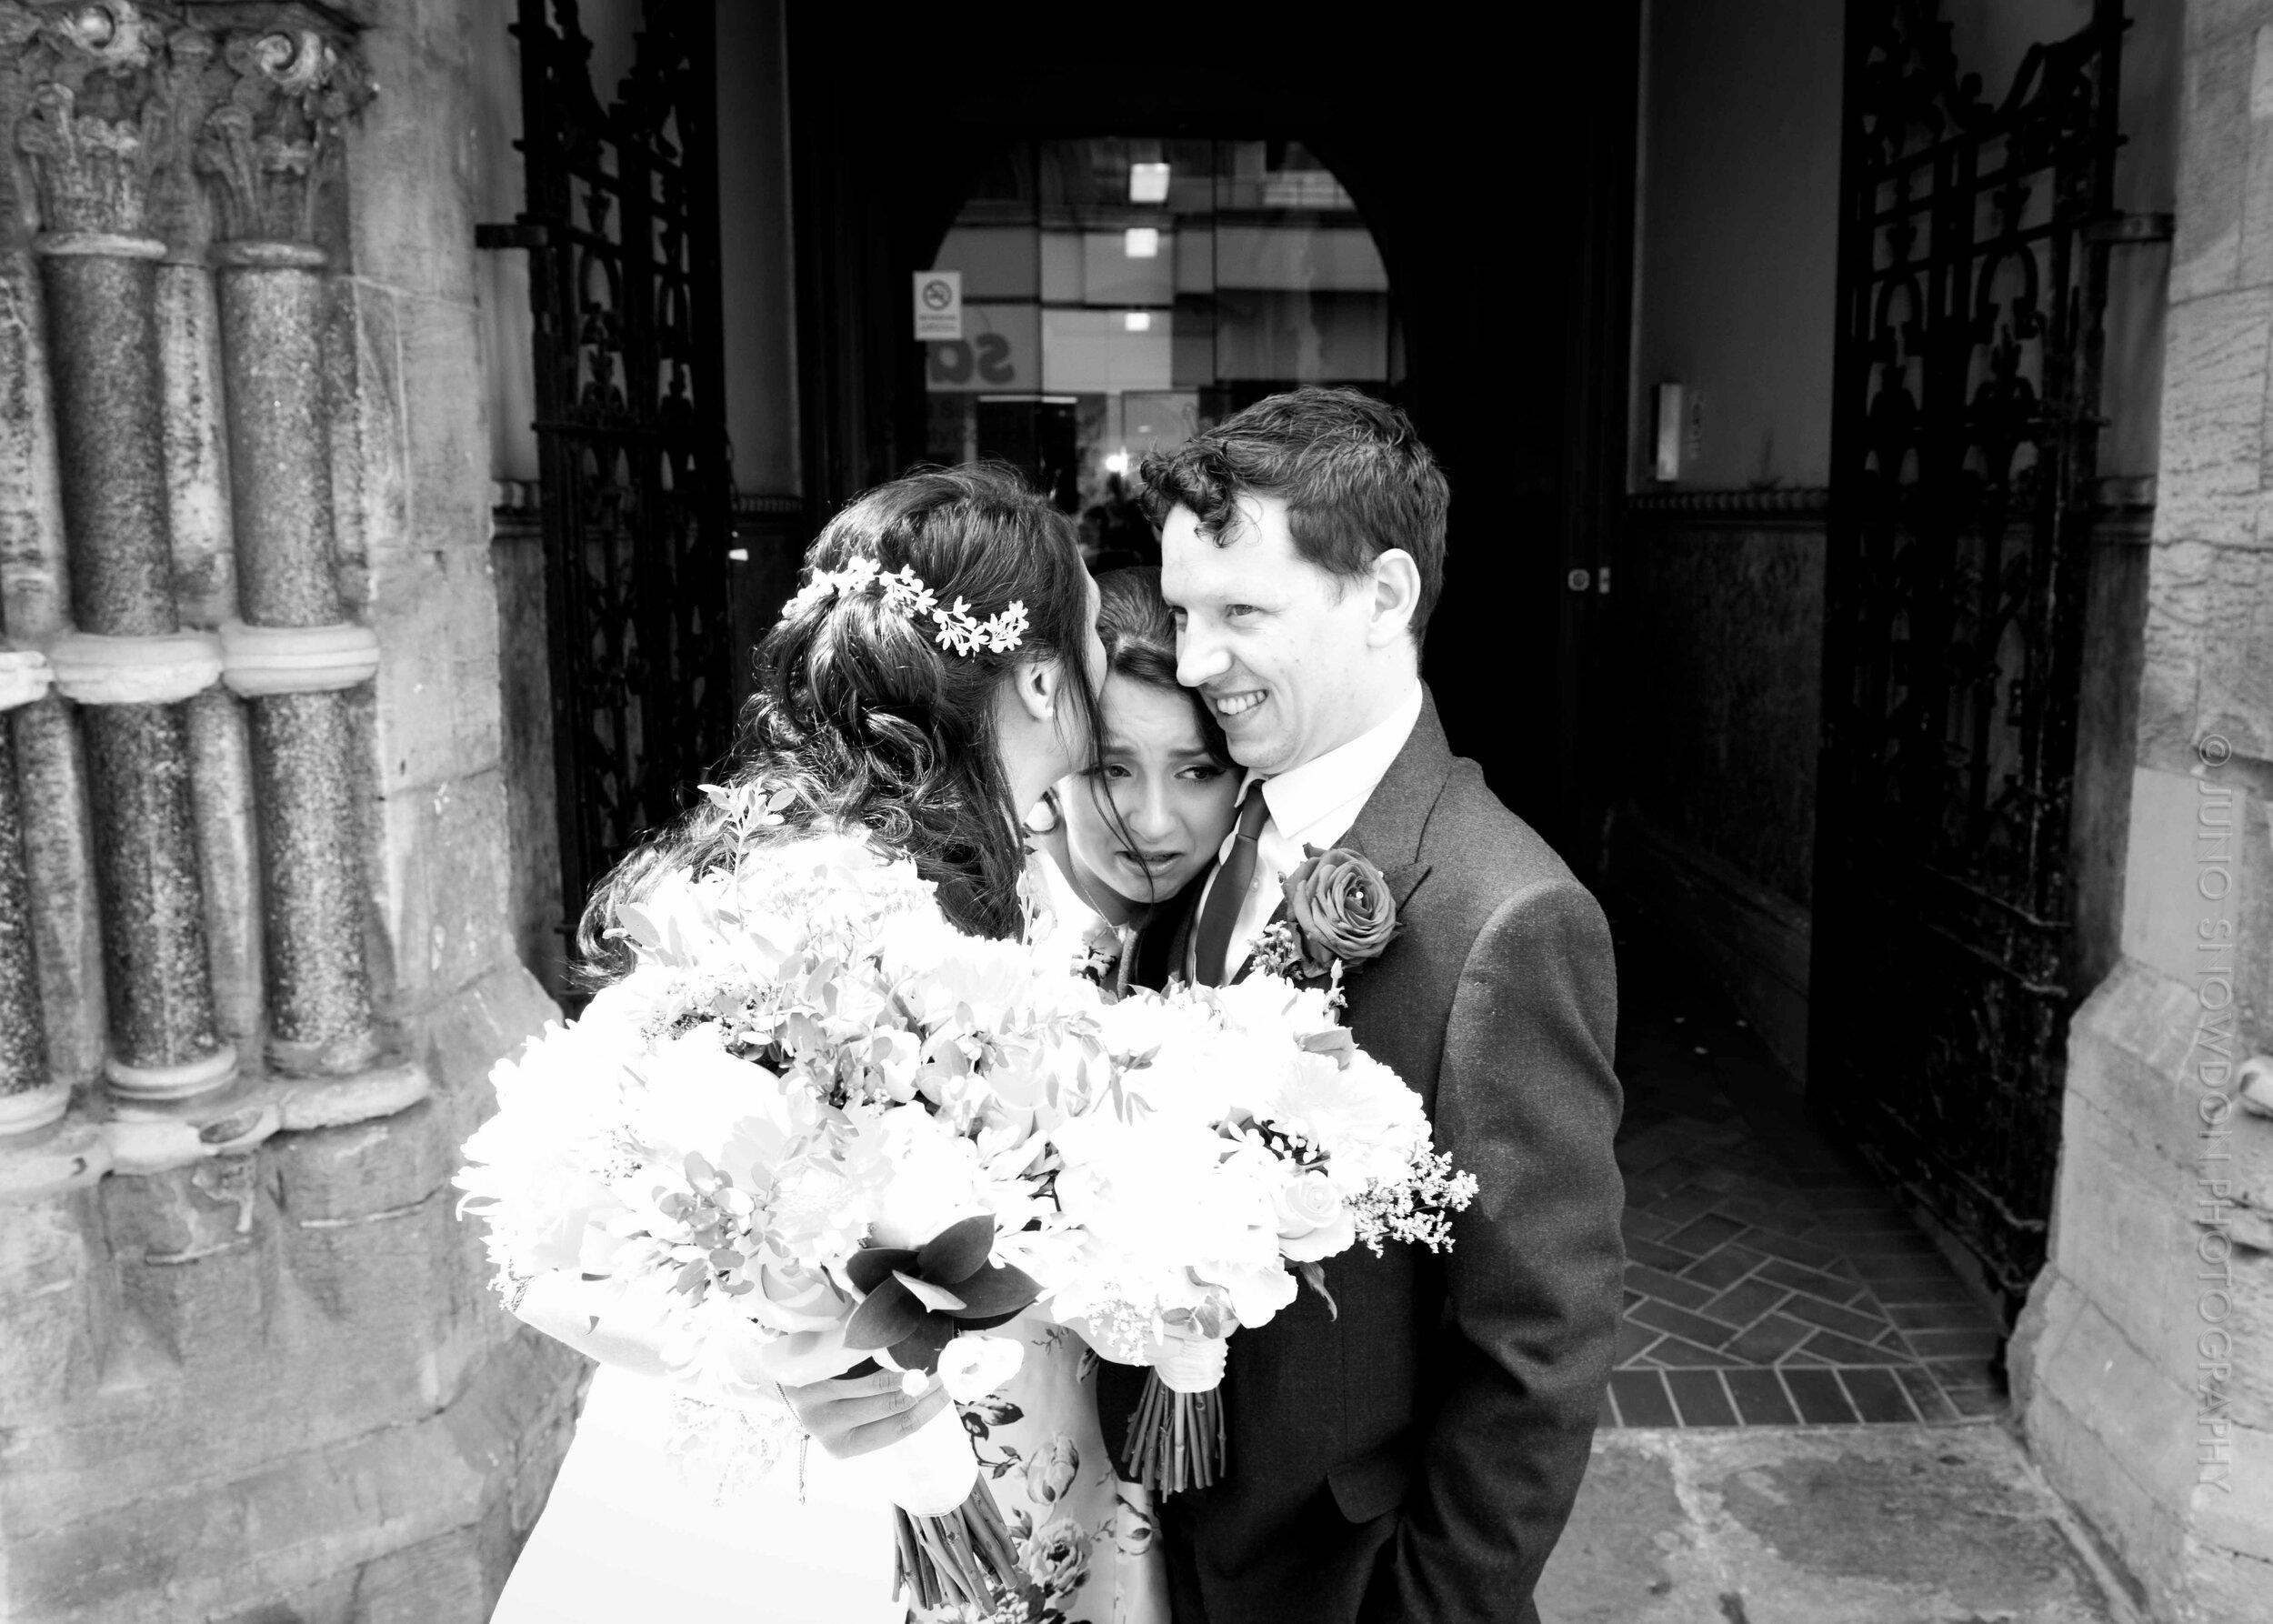 juno-snowdon-photography-wedding-7377.jpg